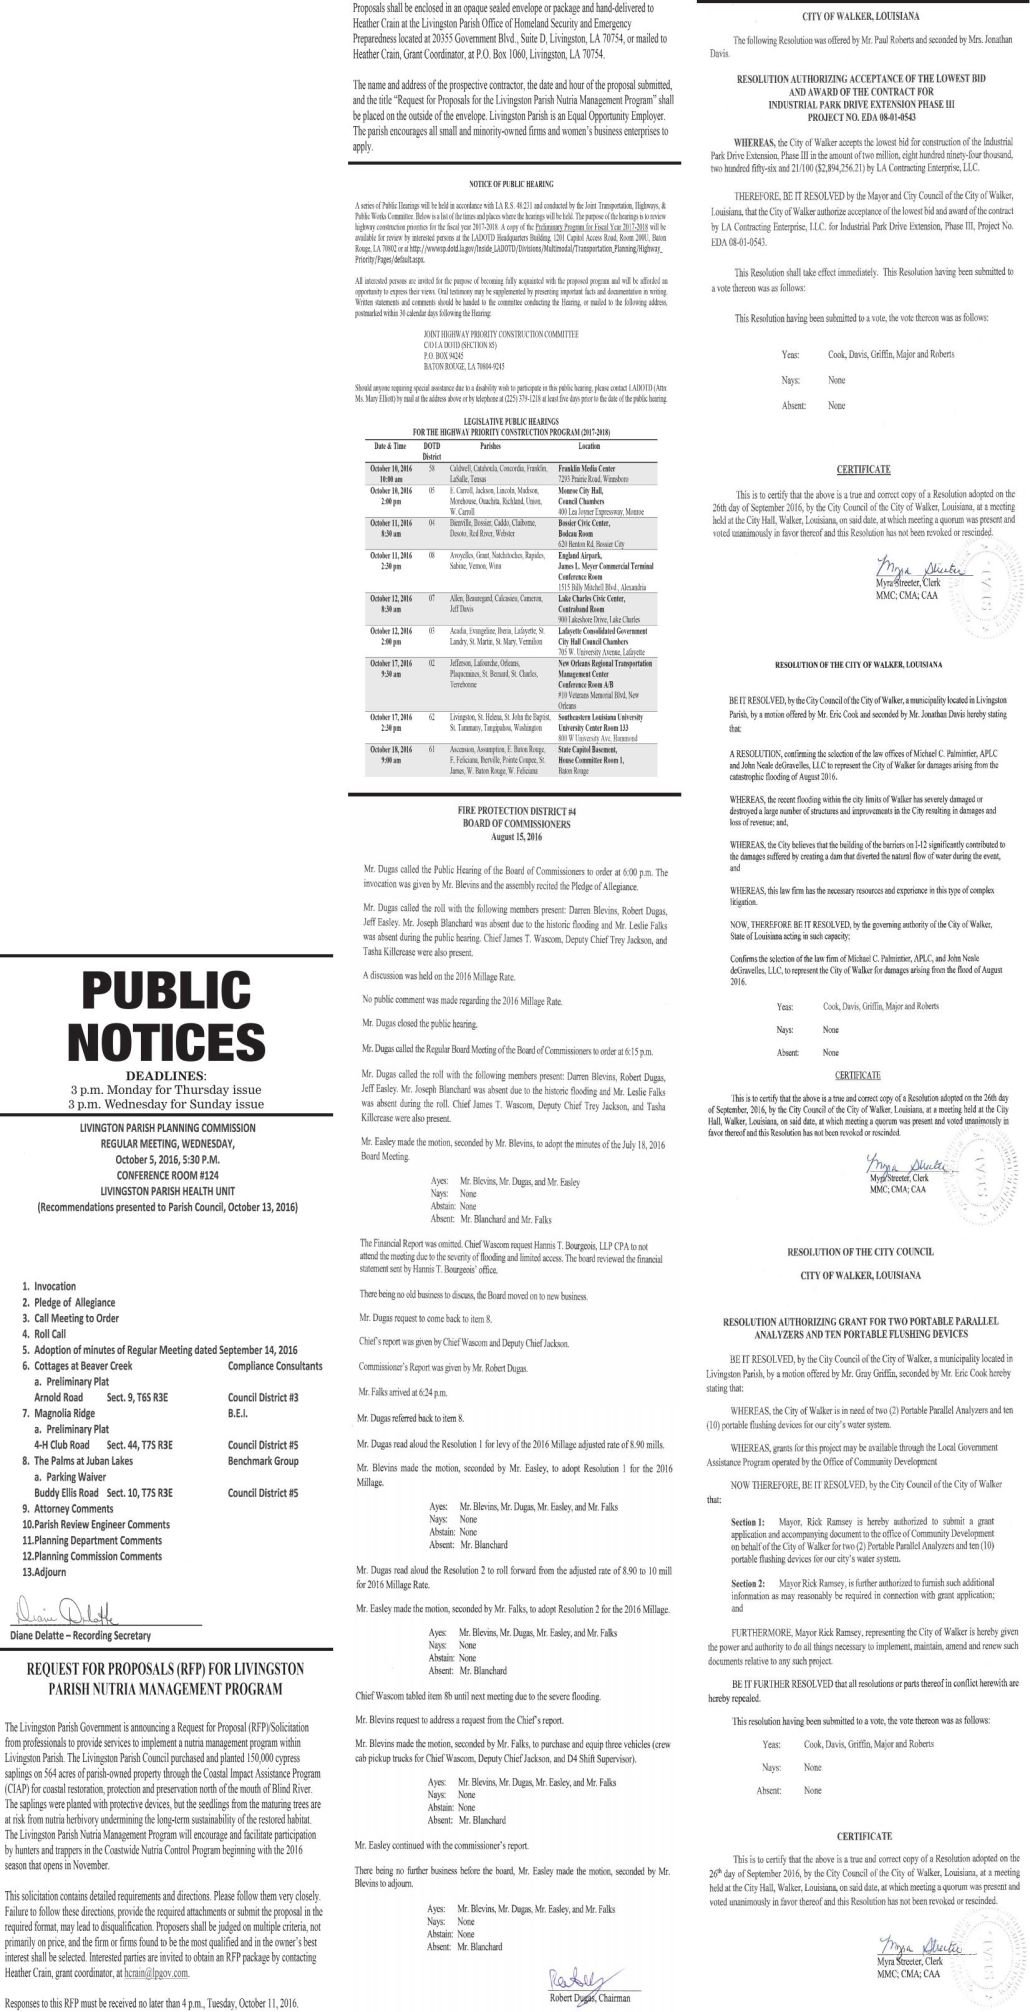 Public Notices published October 2, 2016